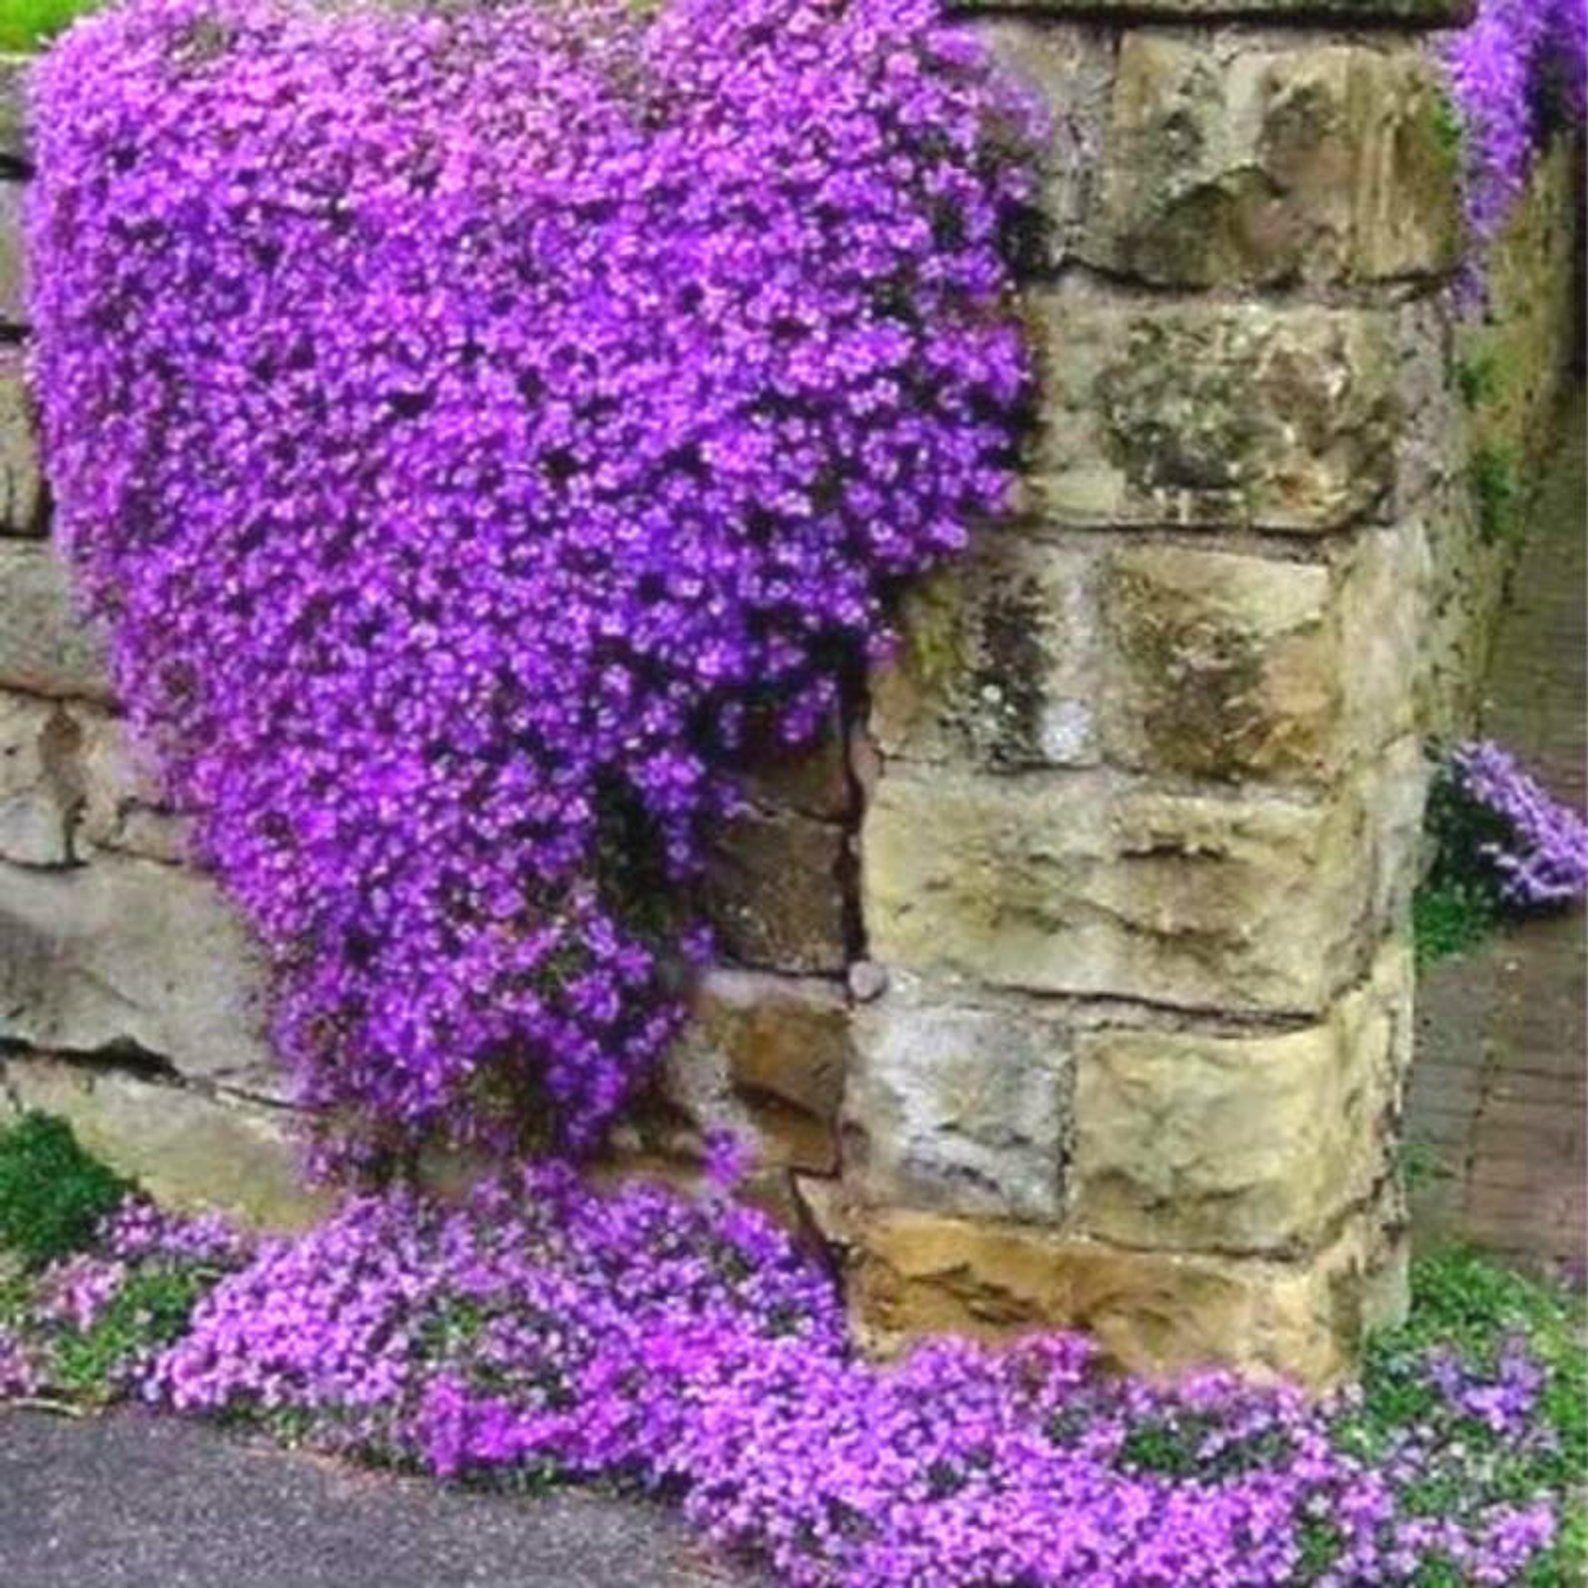 Photo of 50+  AUBRIETA CASCADE PURPLE Rock Cress / Easy  Perennial  Fragrant  Deer Resistant Ground Cover Flower Seeds